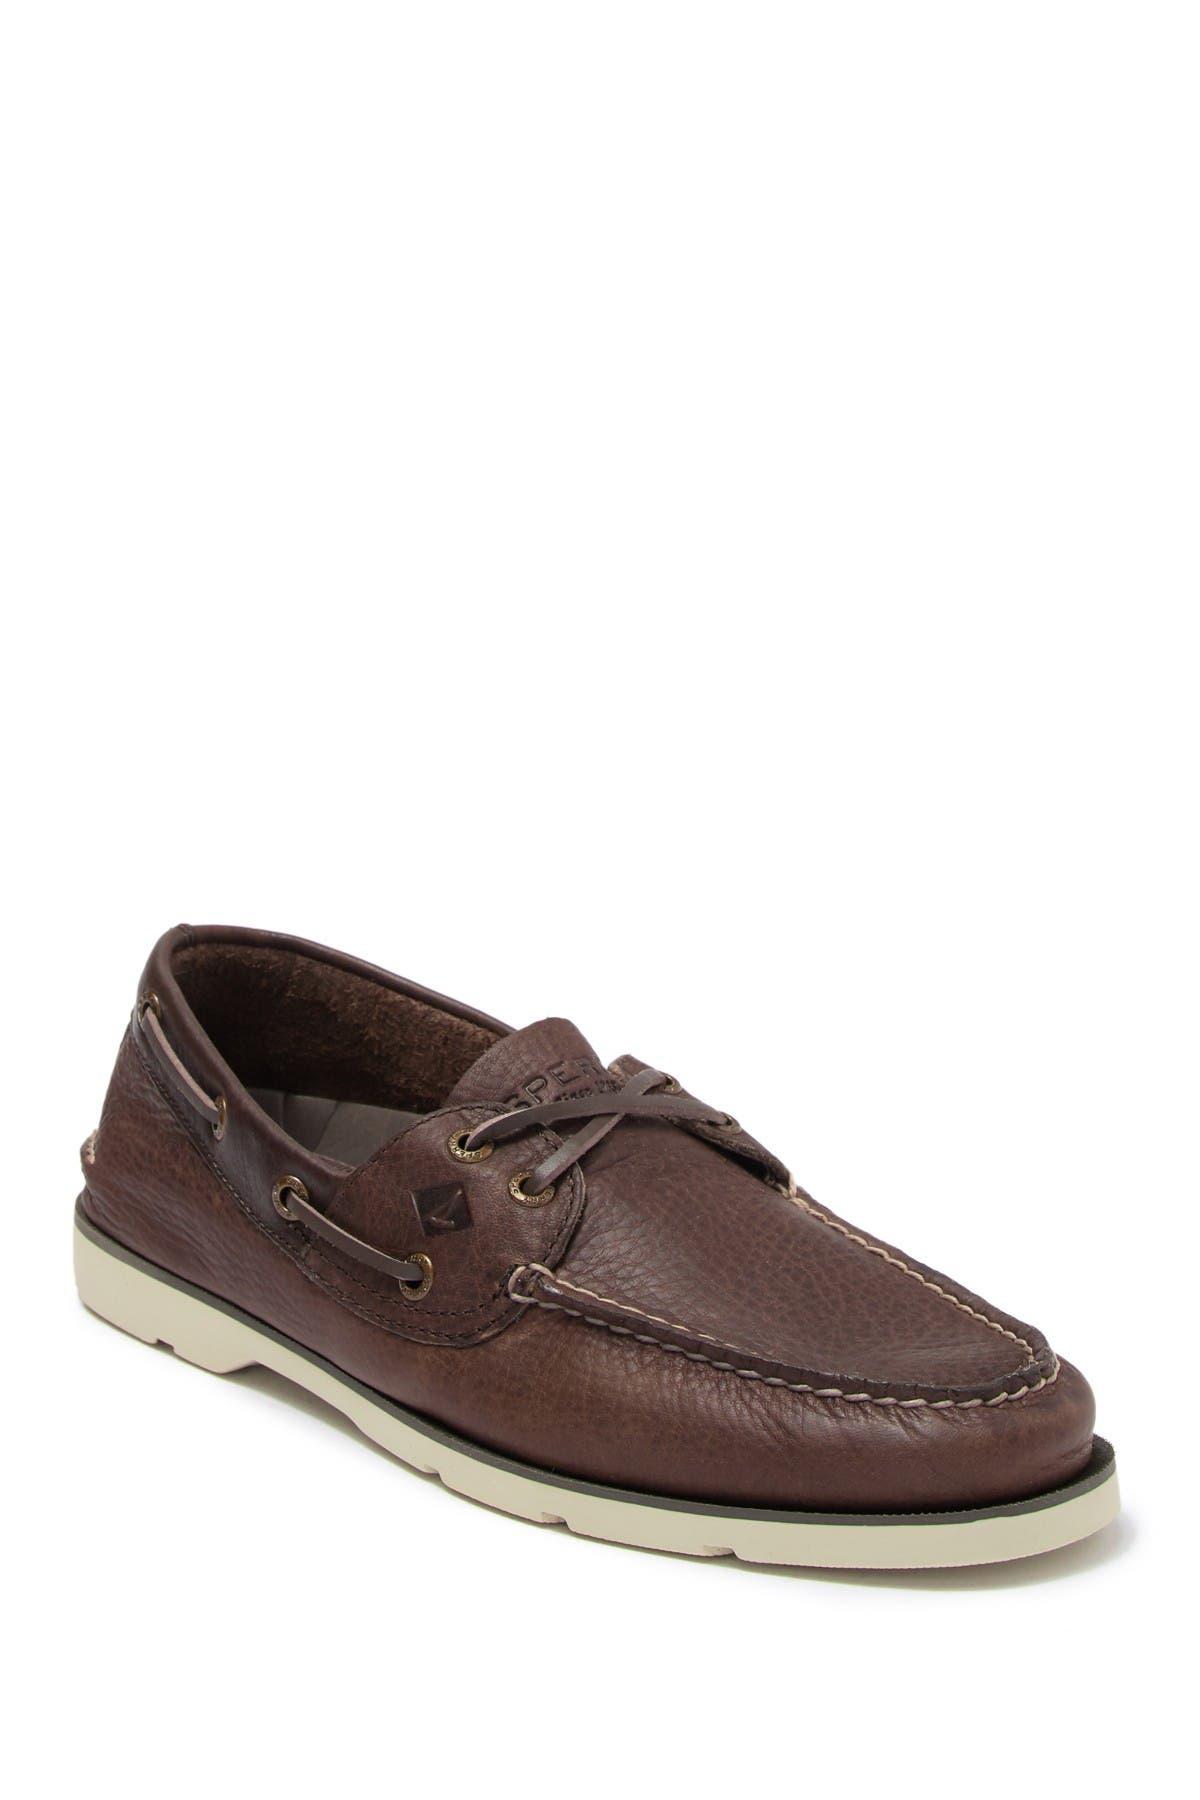 Image of Sperry Leeward 2 Eye Leather Boat Shoe